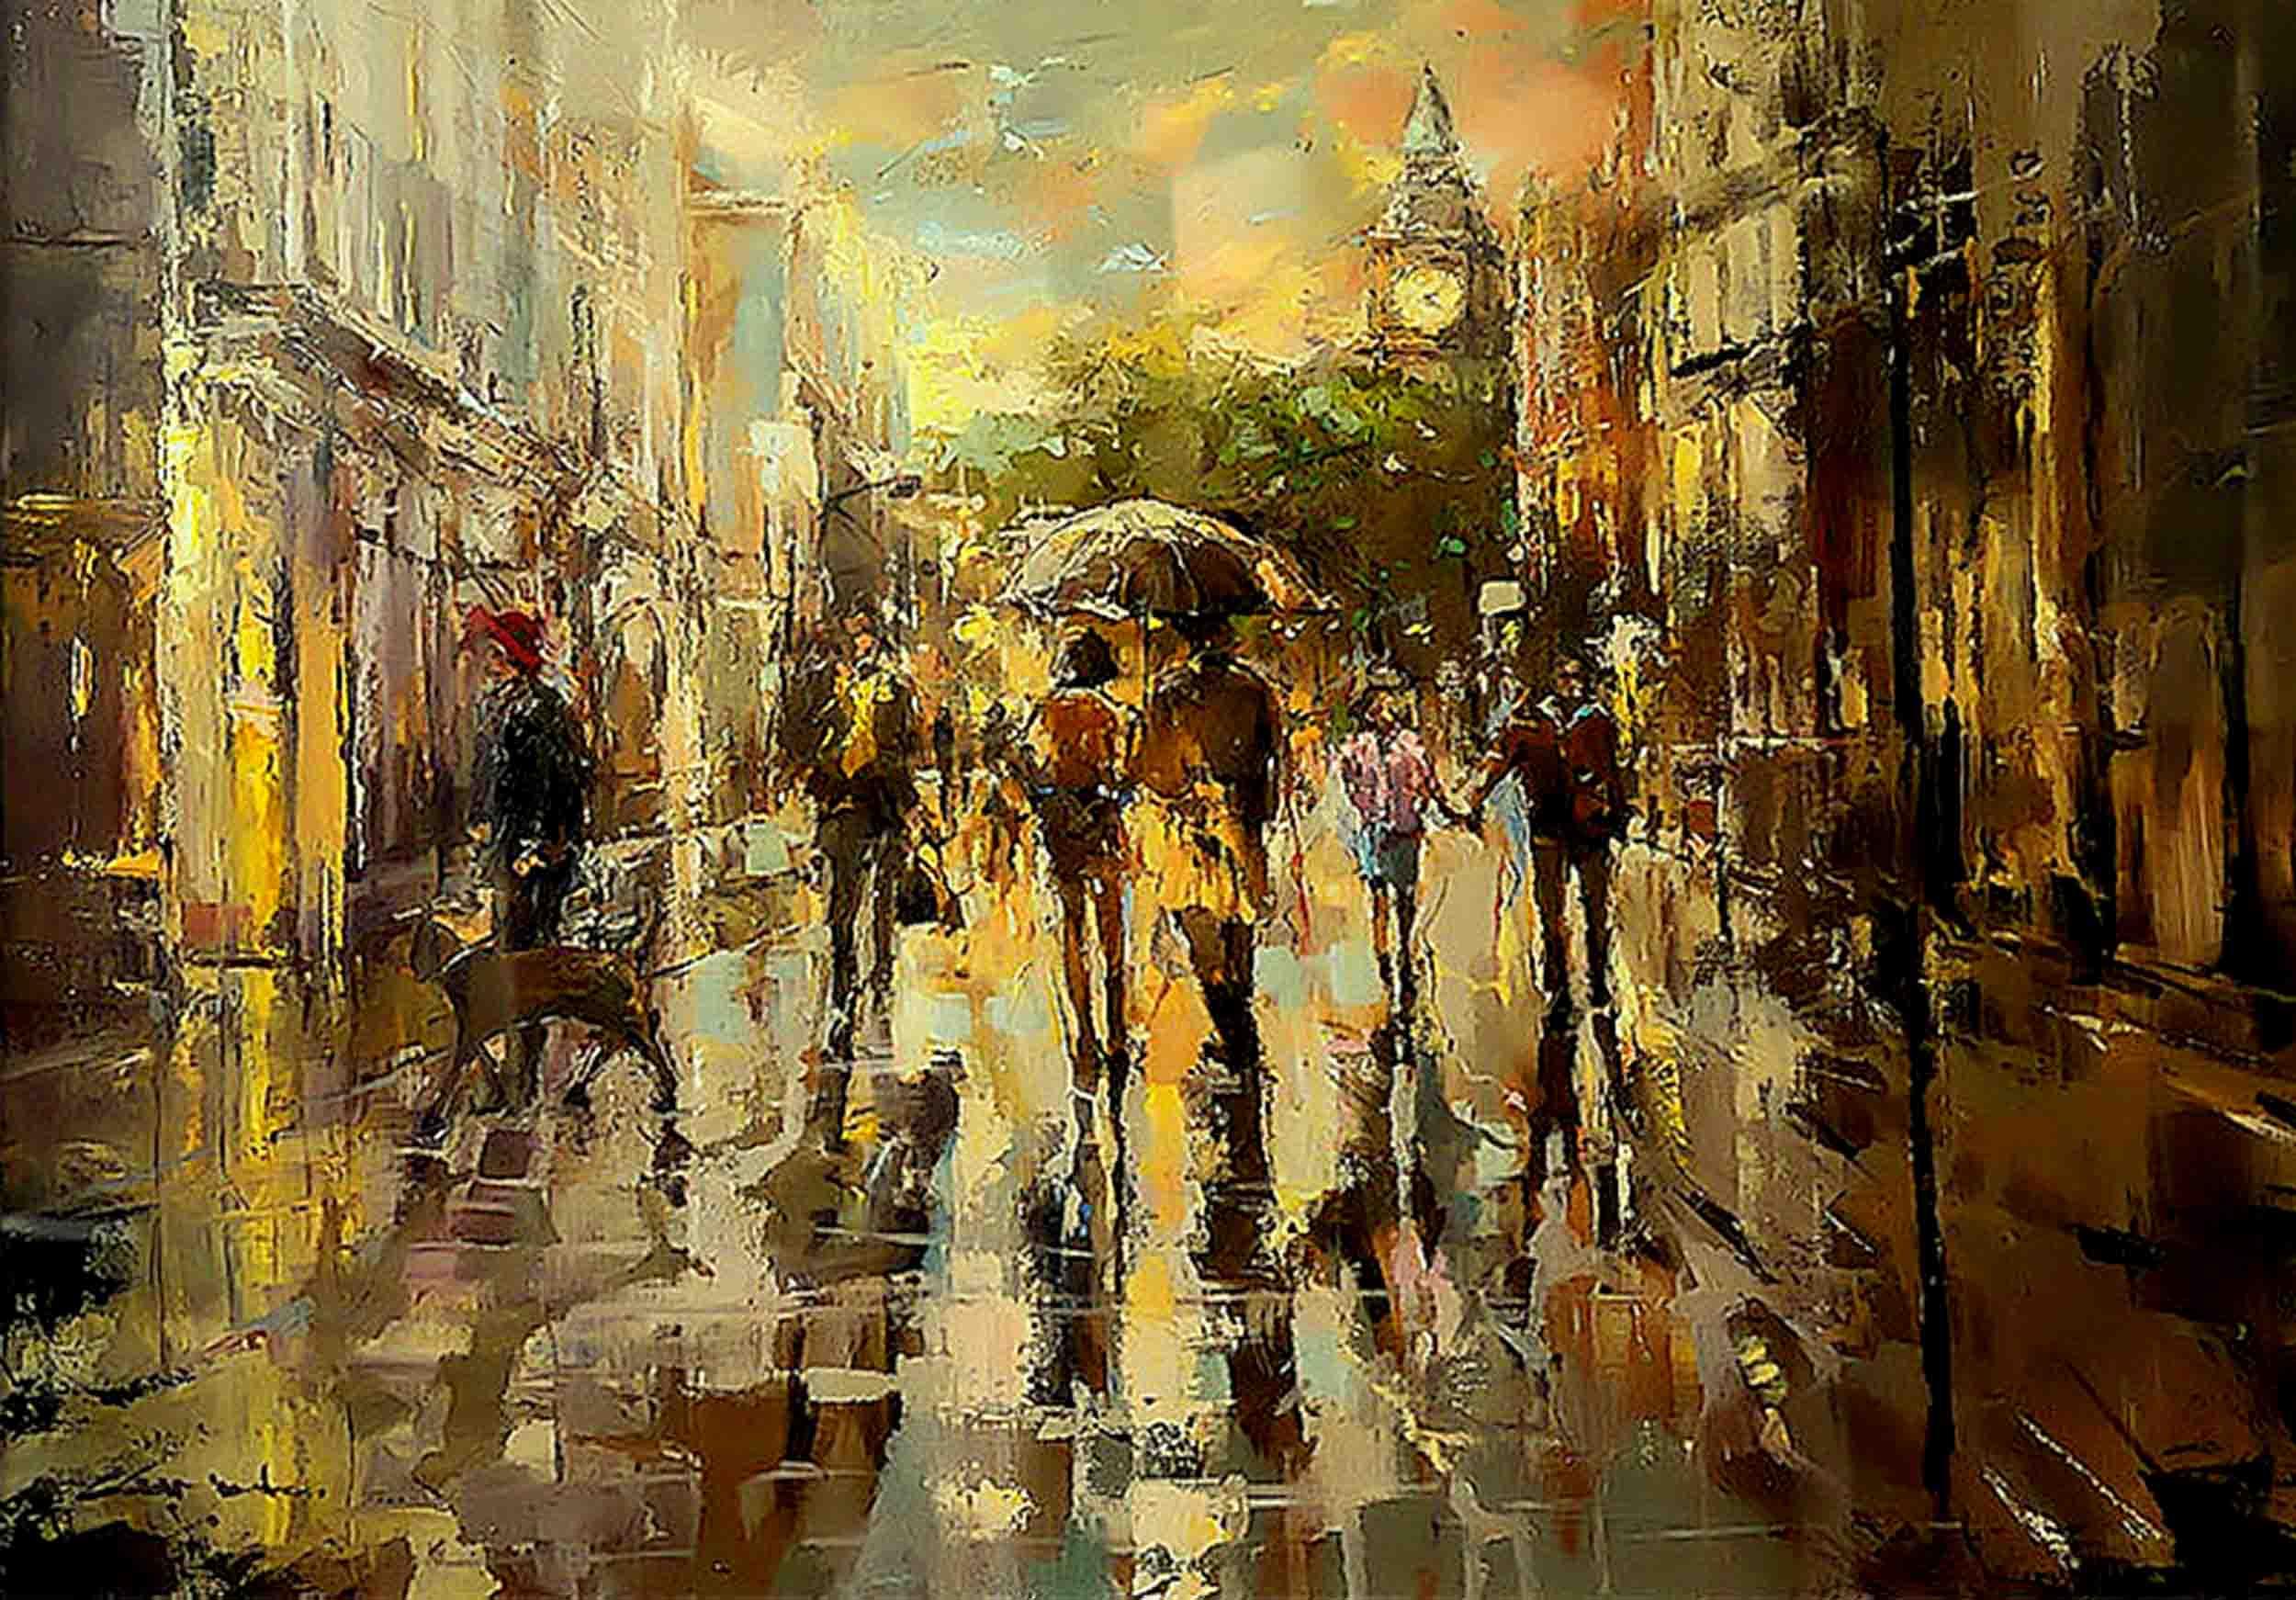 London Rain by Ewa Czarniecka